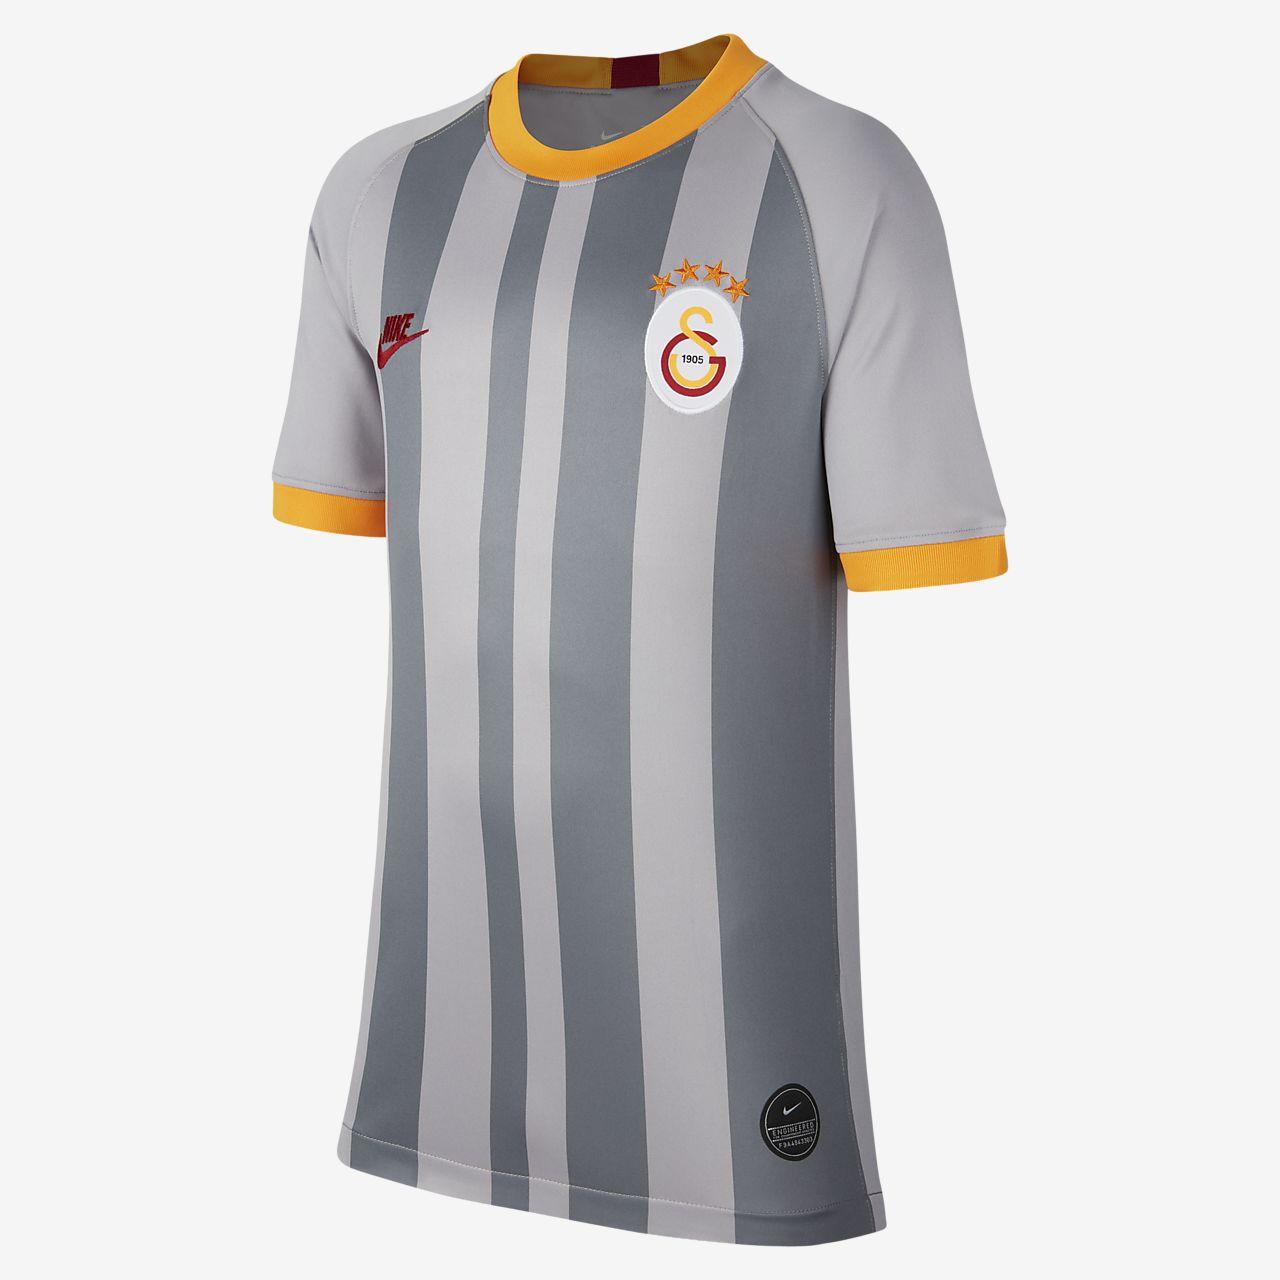 Camiseta de fútbol alternativa para niños talla grande Stadium del Galatasaray 2019/20